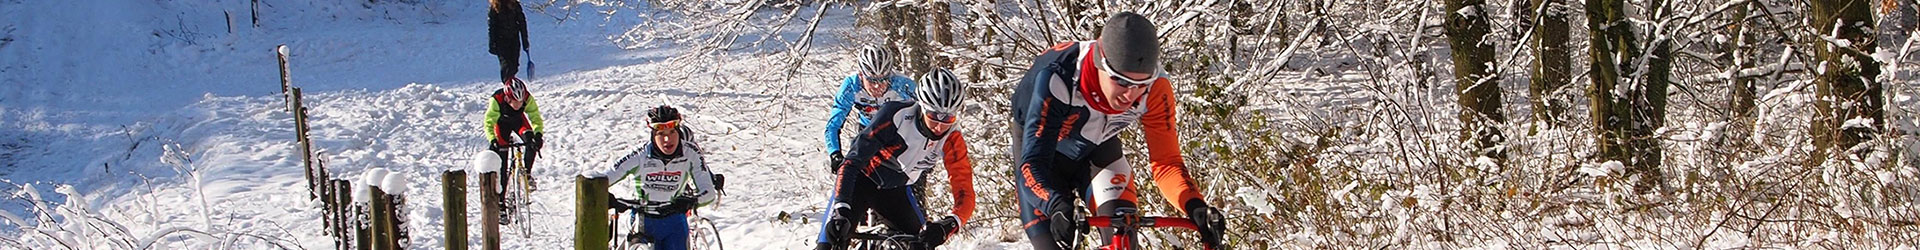 bike riders climbing on snowy hill